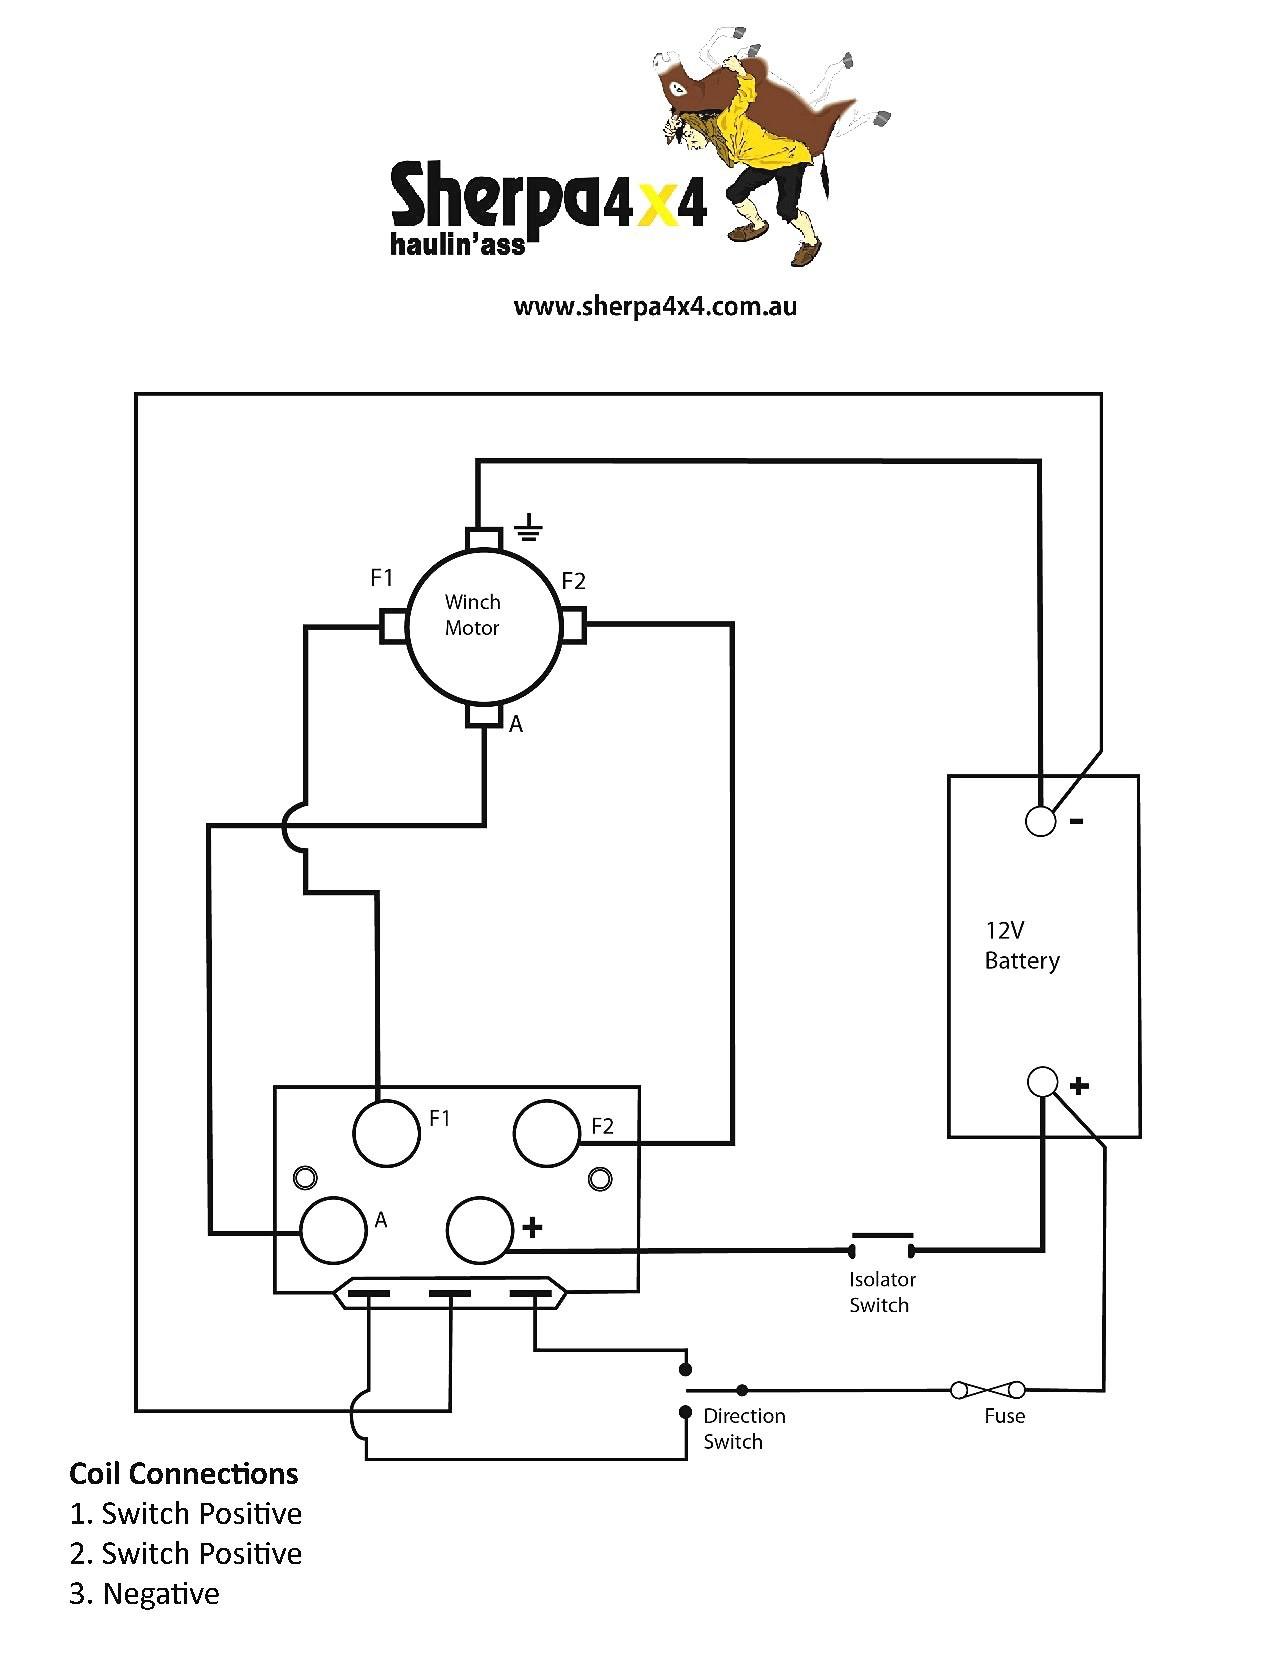 4 Wheeler Winch Wiring Diagram - Wiring Library